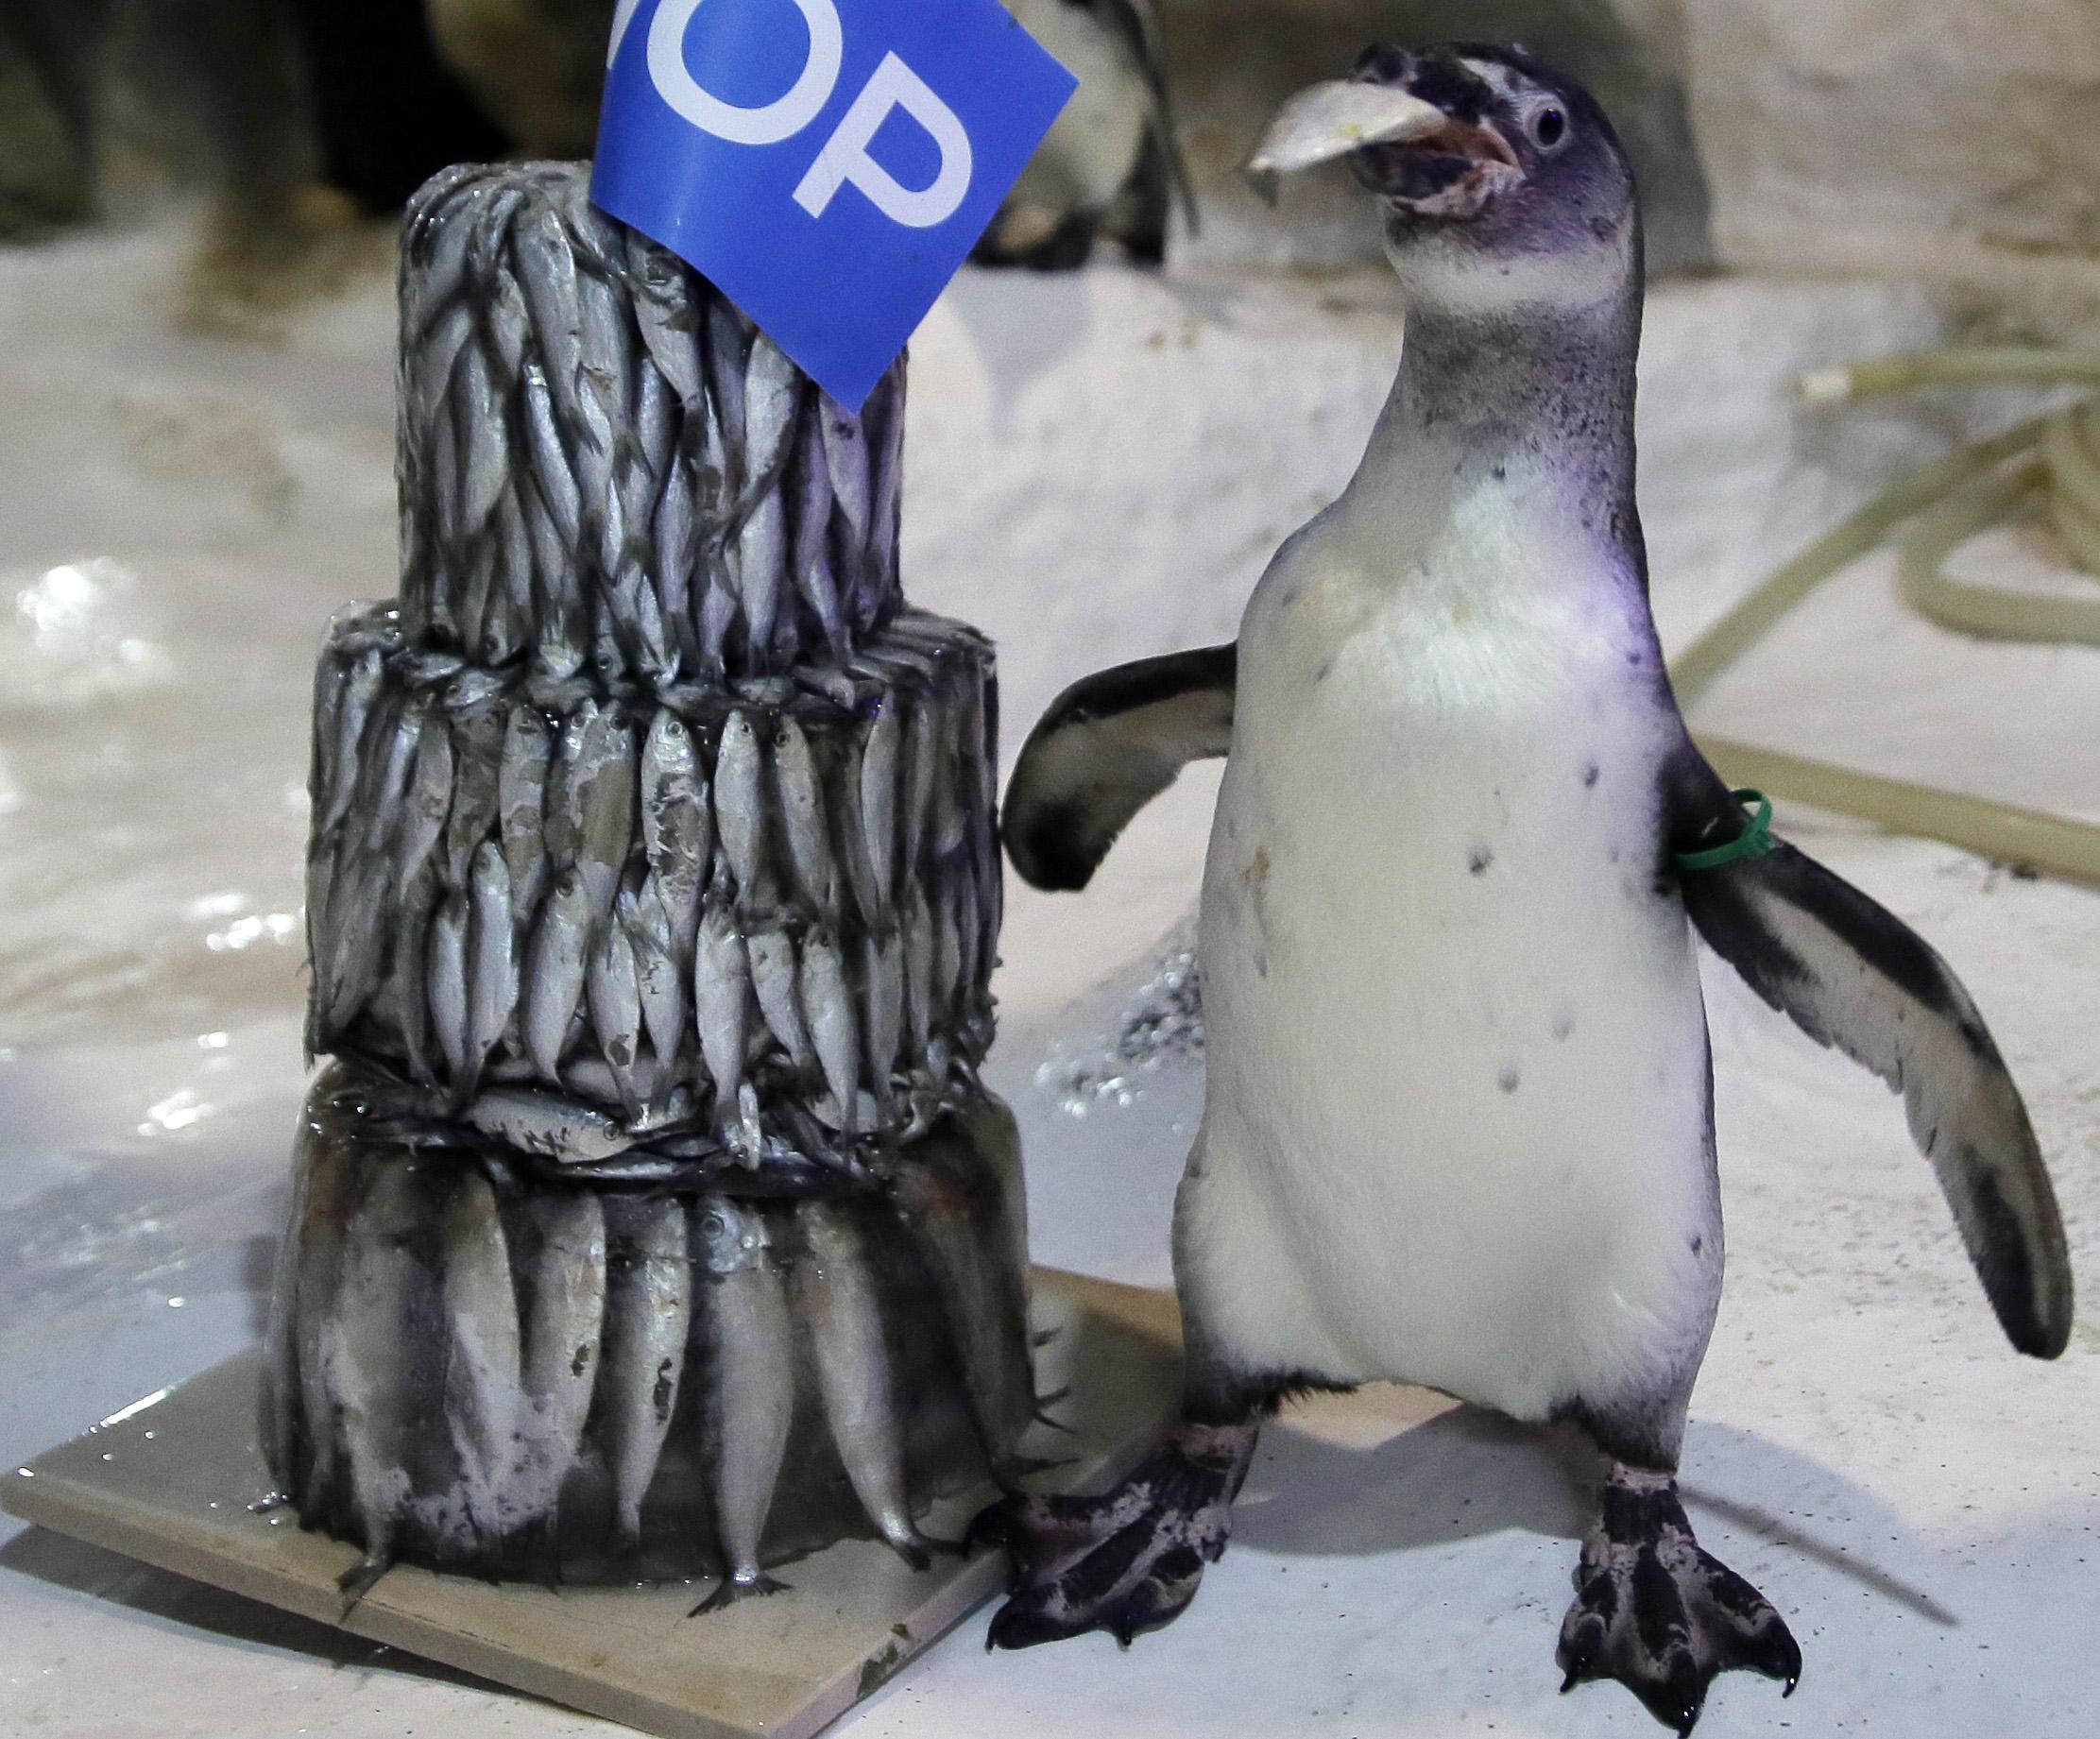 Penguin Celebrates Birthday With Unique Cake